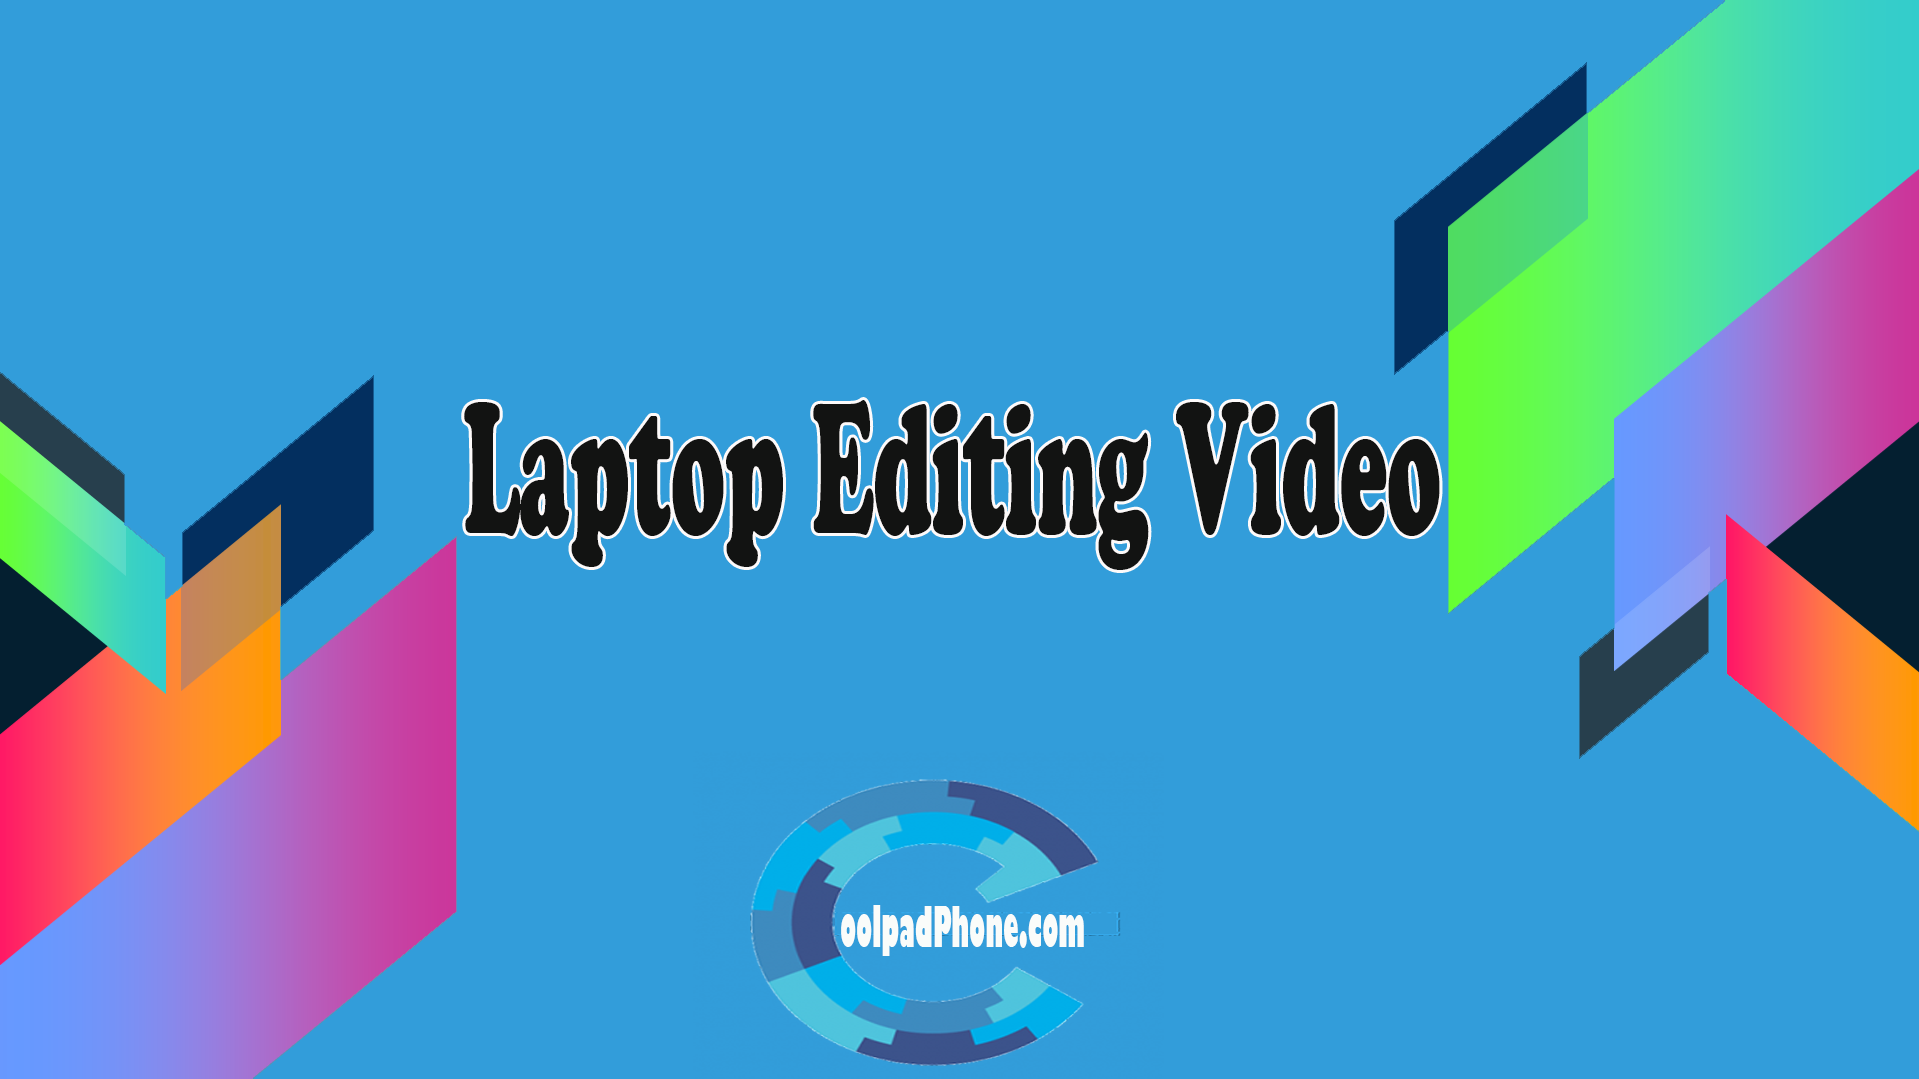 Laptop-Editing-Video